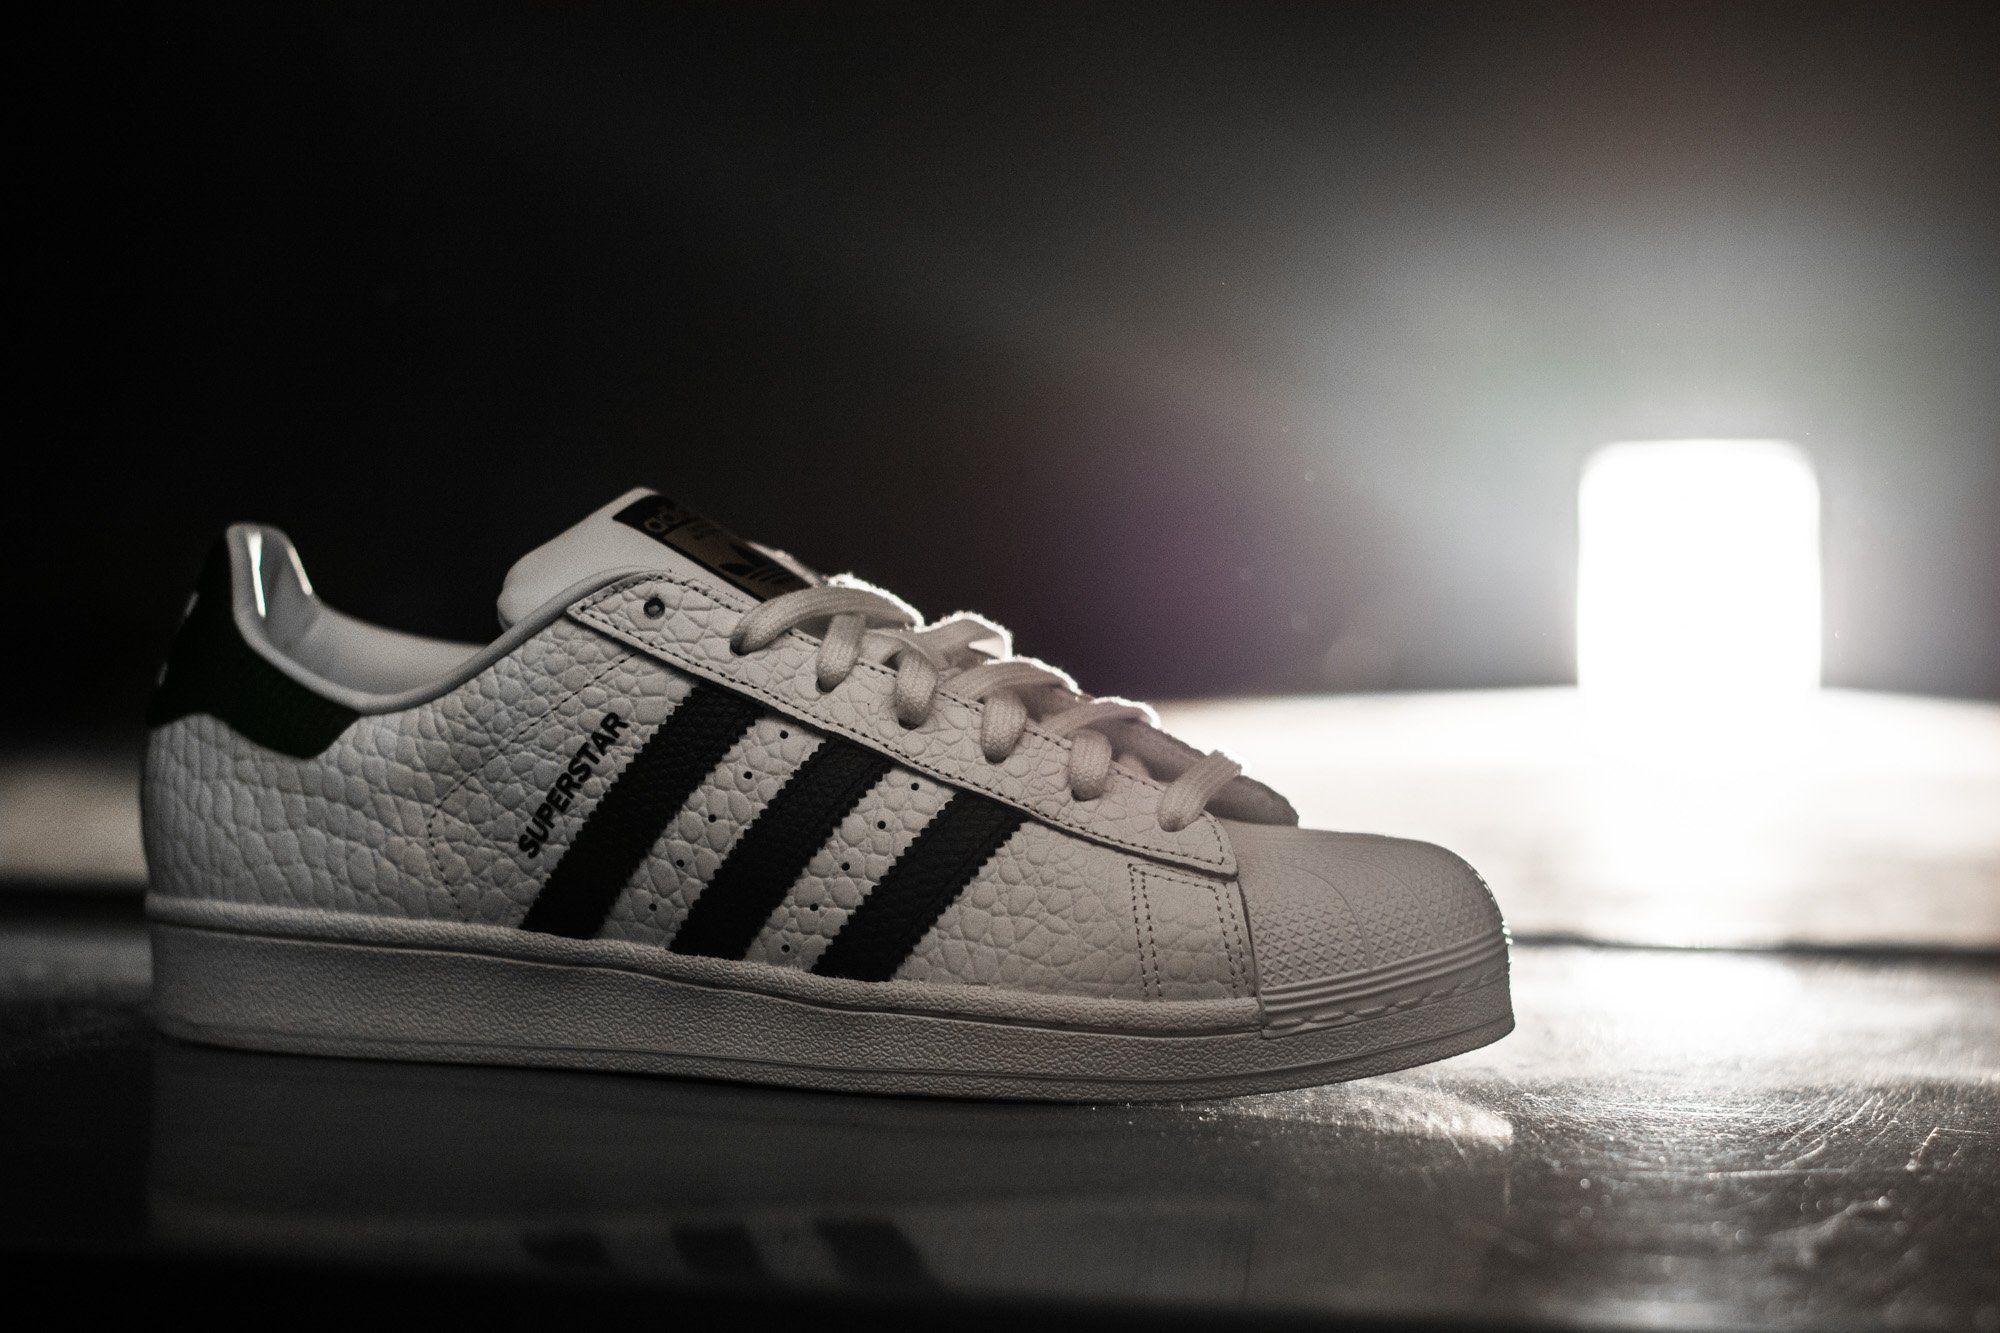 fancy adidas superstar animale s75157 sacchi & scarpe originali.